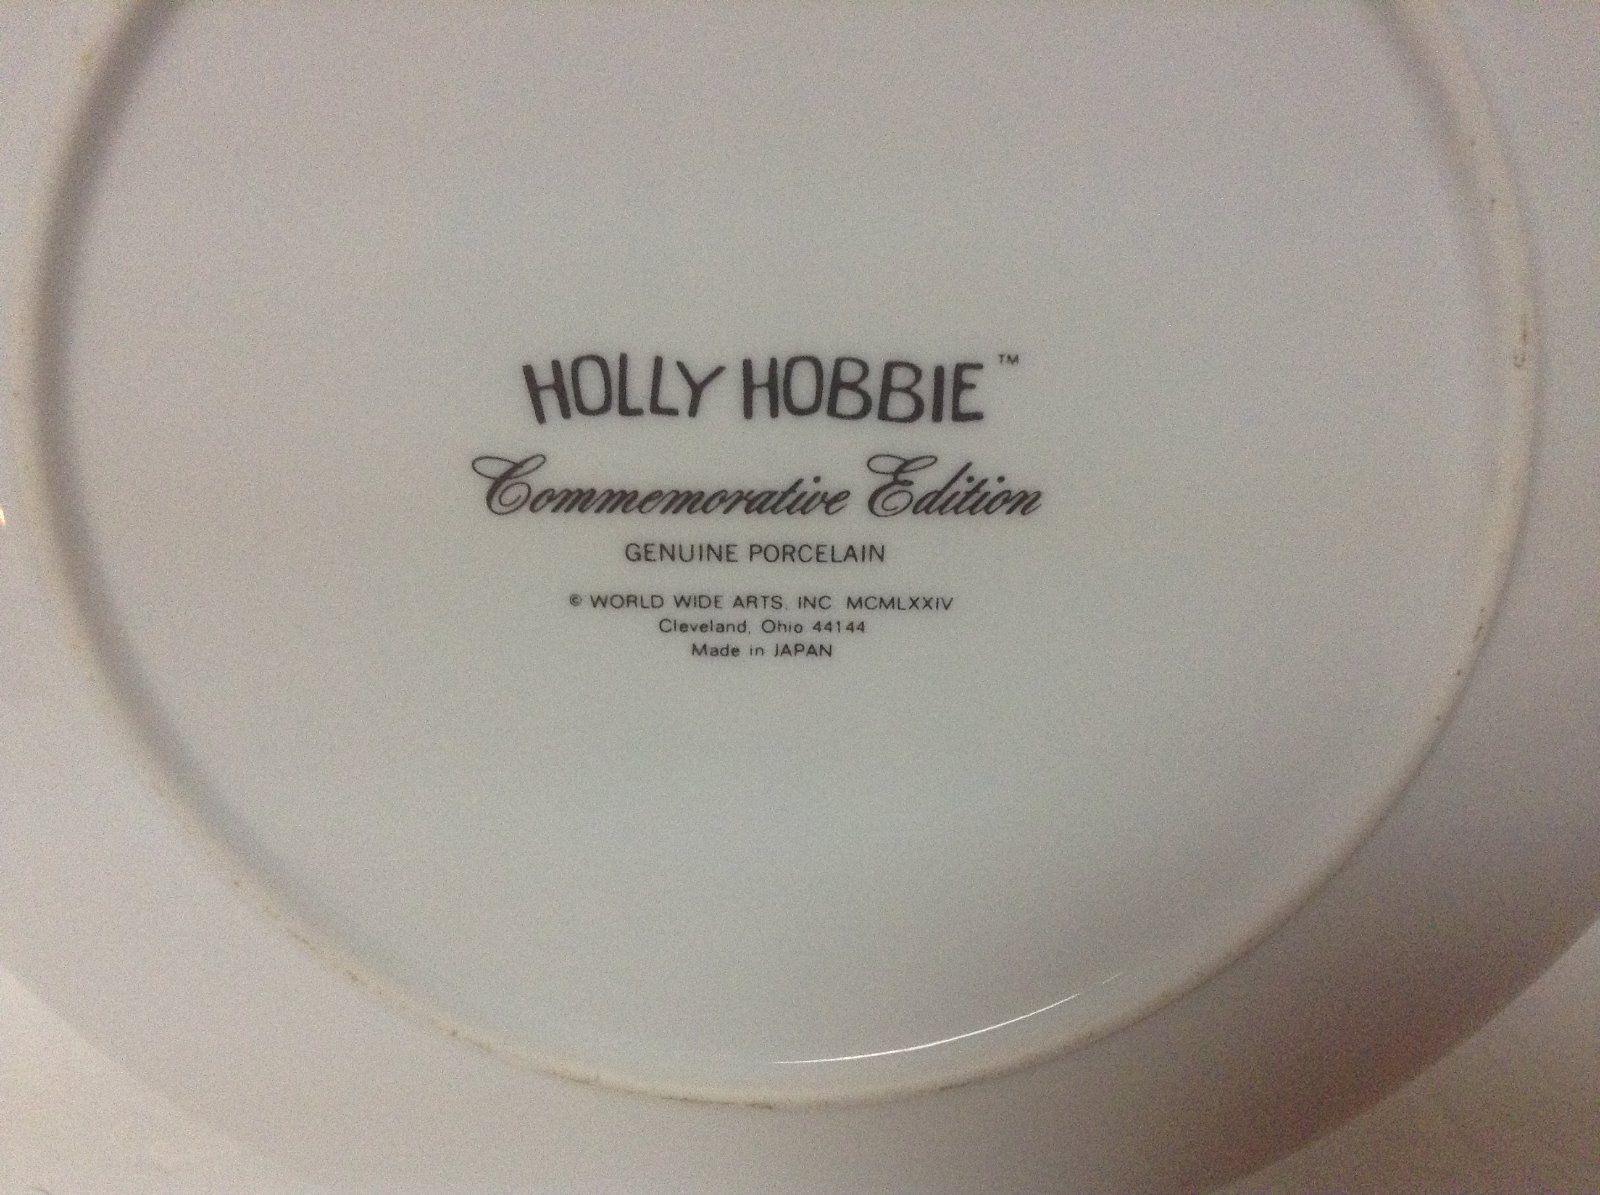 HOLLY HOBBIE Motherhood 1974 Commemorative Edition Porcelain Plate